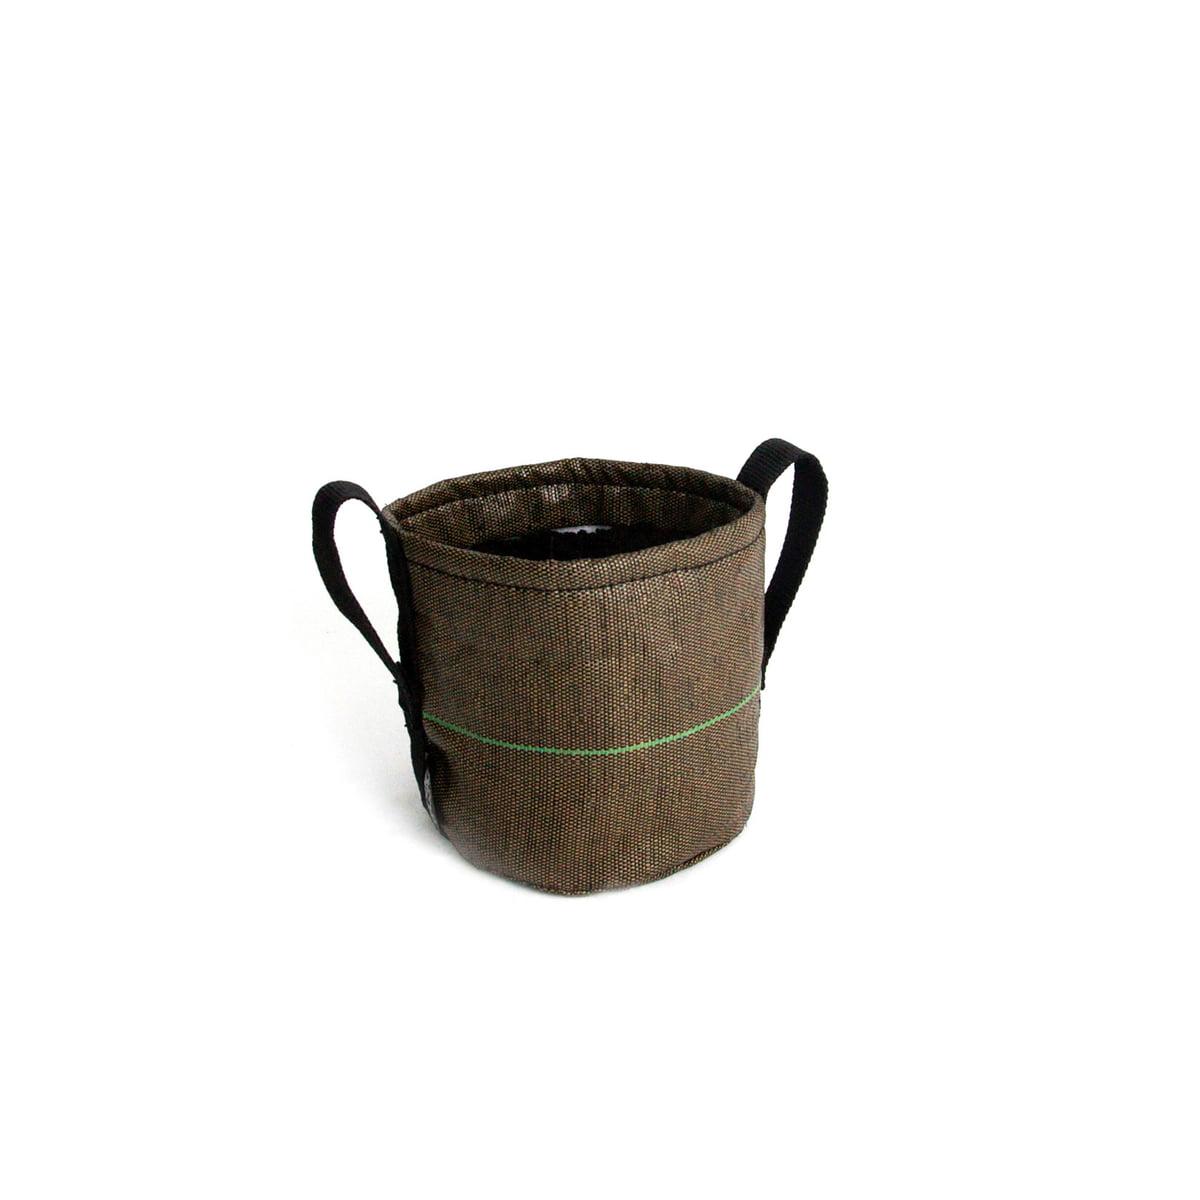 Bacsac Pflanztasche Pot 10 L Yucca